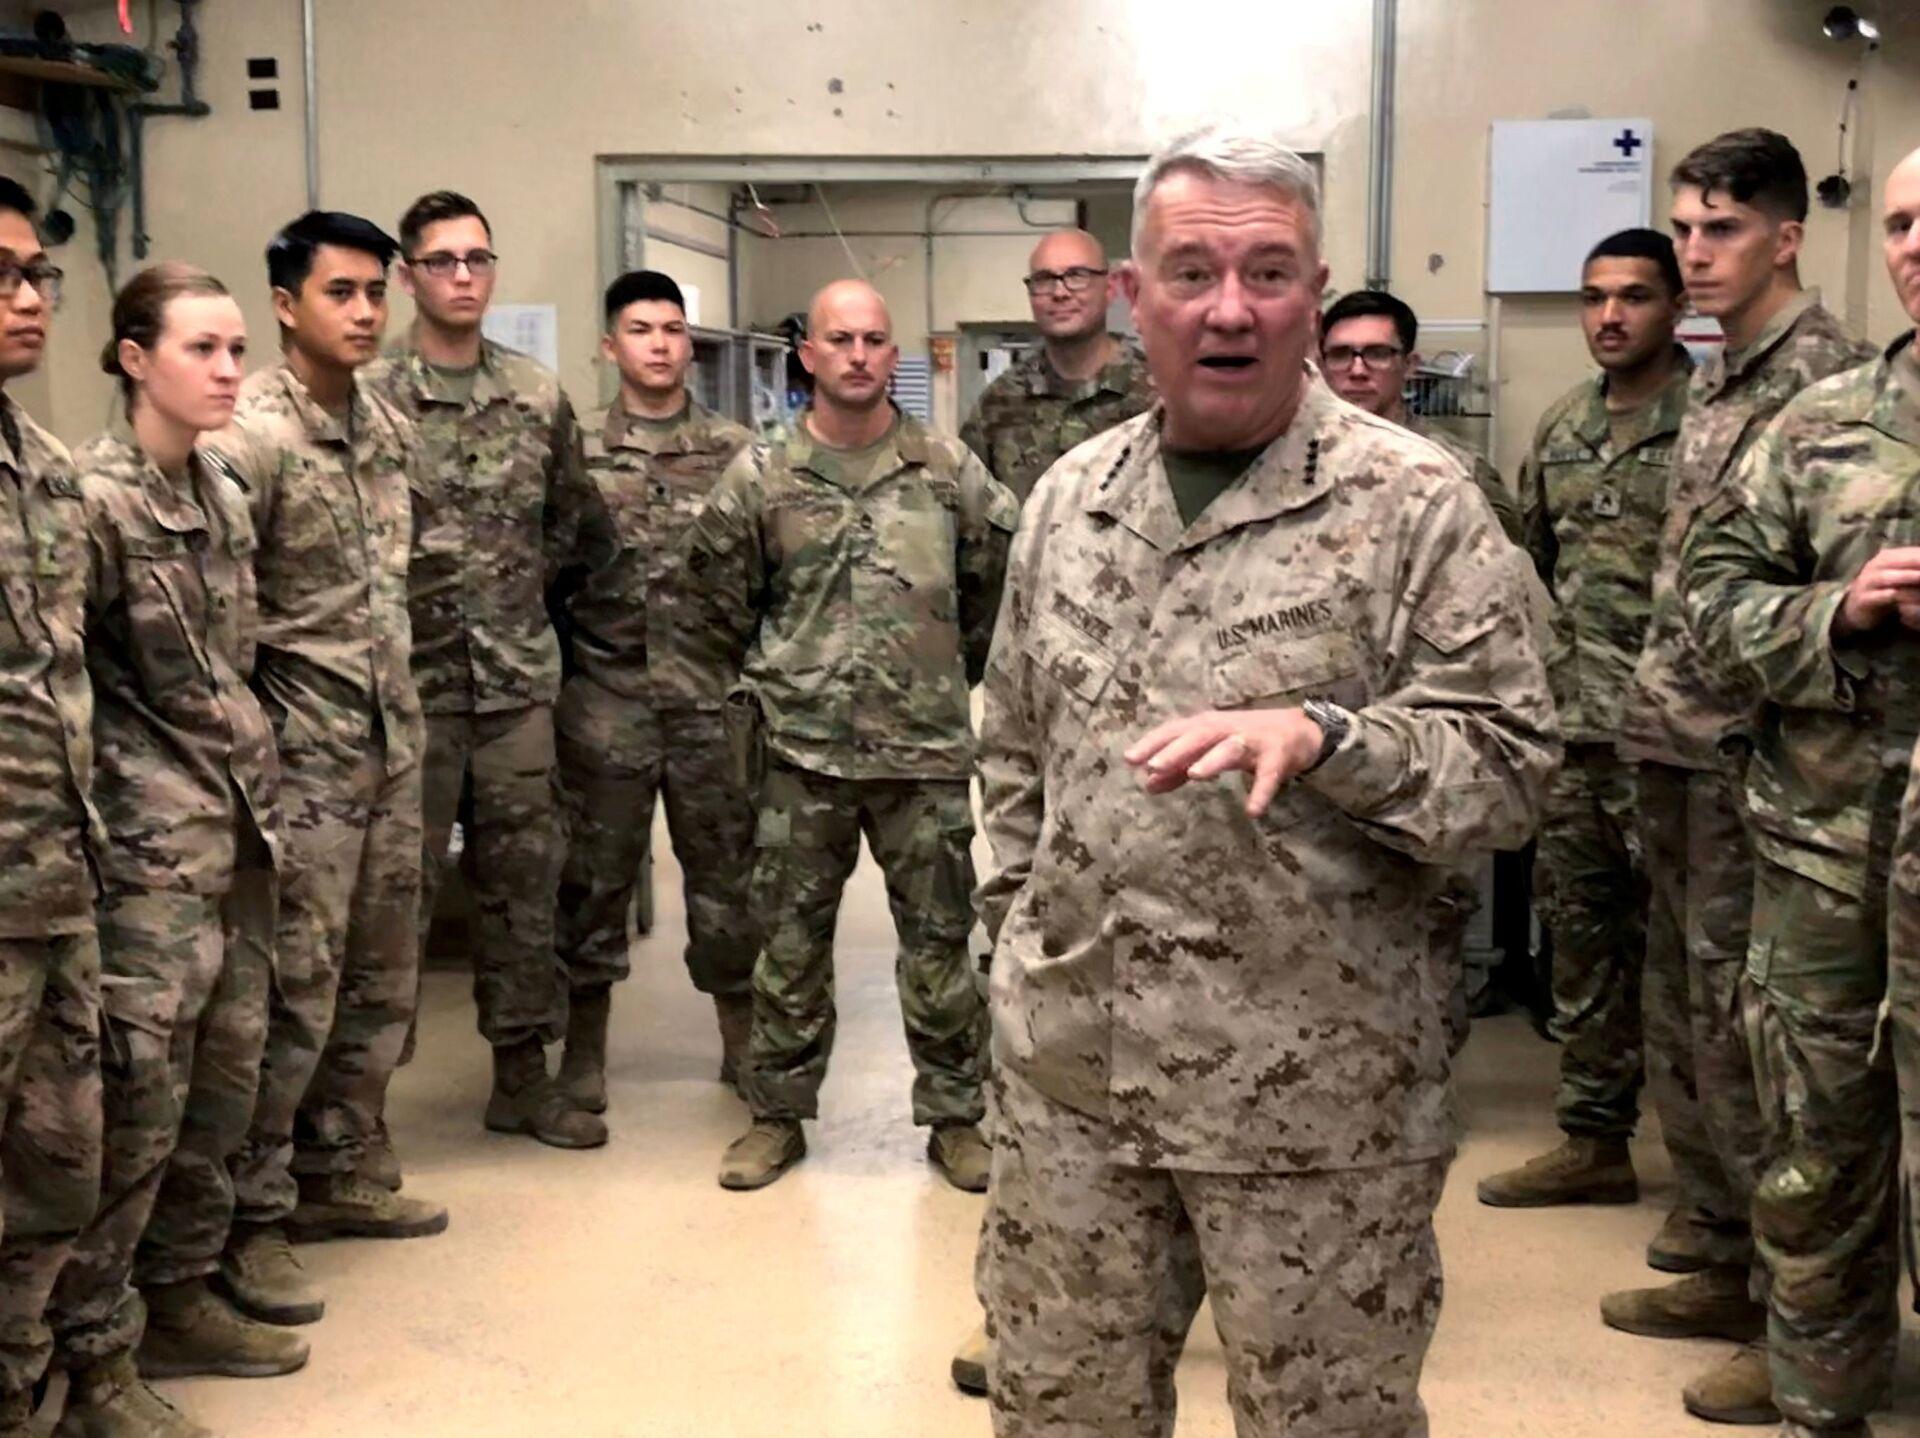 Marine General Kenneth McKenzie, head of U.S. Central Command, speaks with U.S. troops while visiting Forward Operating Base Fenty in Jalalabad, Afghanistan, September 9, 2019 - Sputnik International, 1920, 07.09.2021